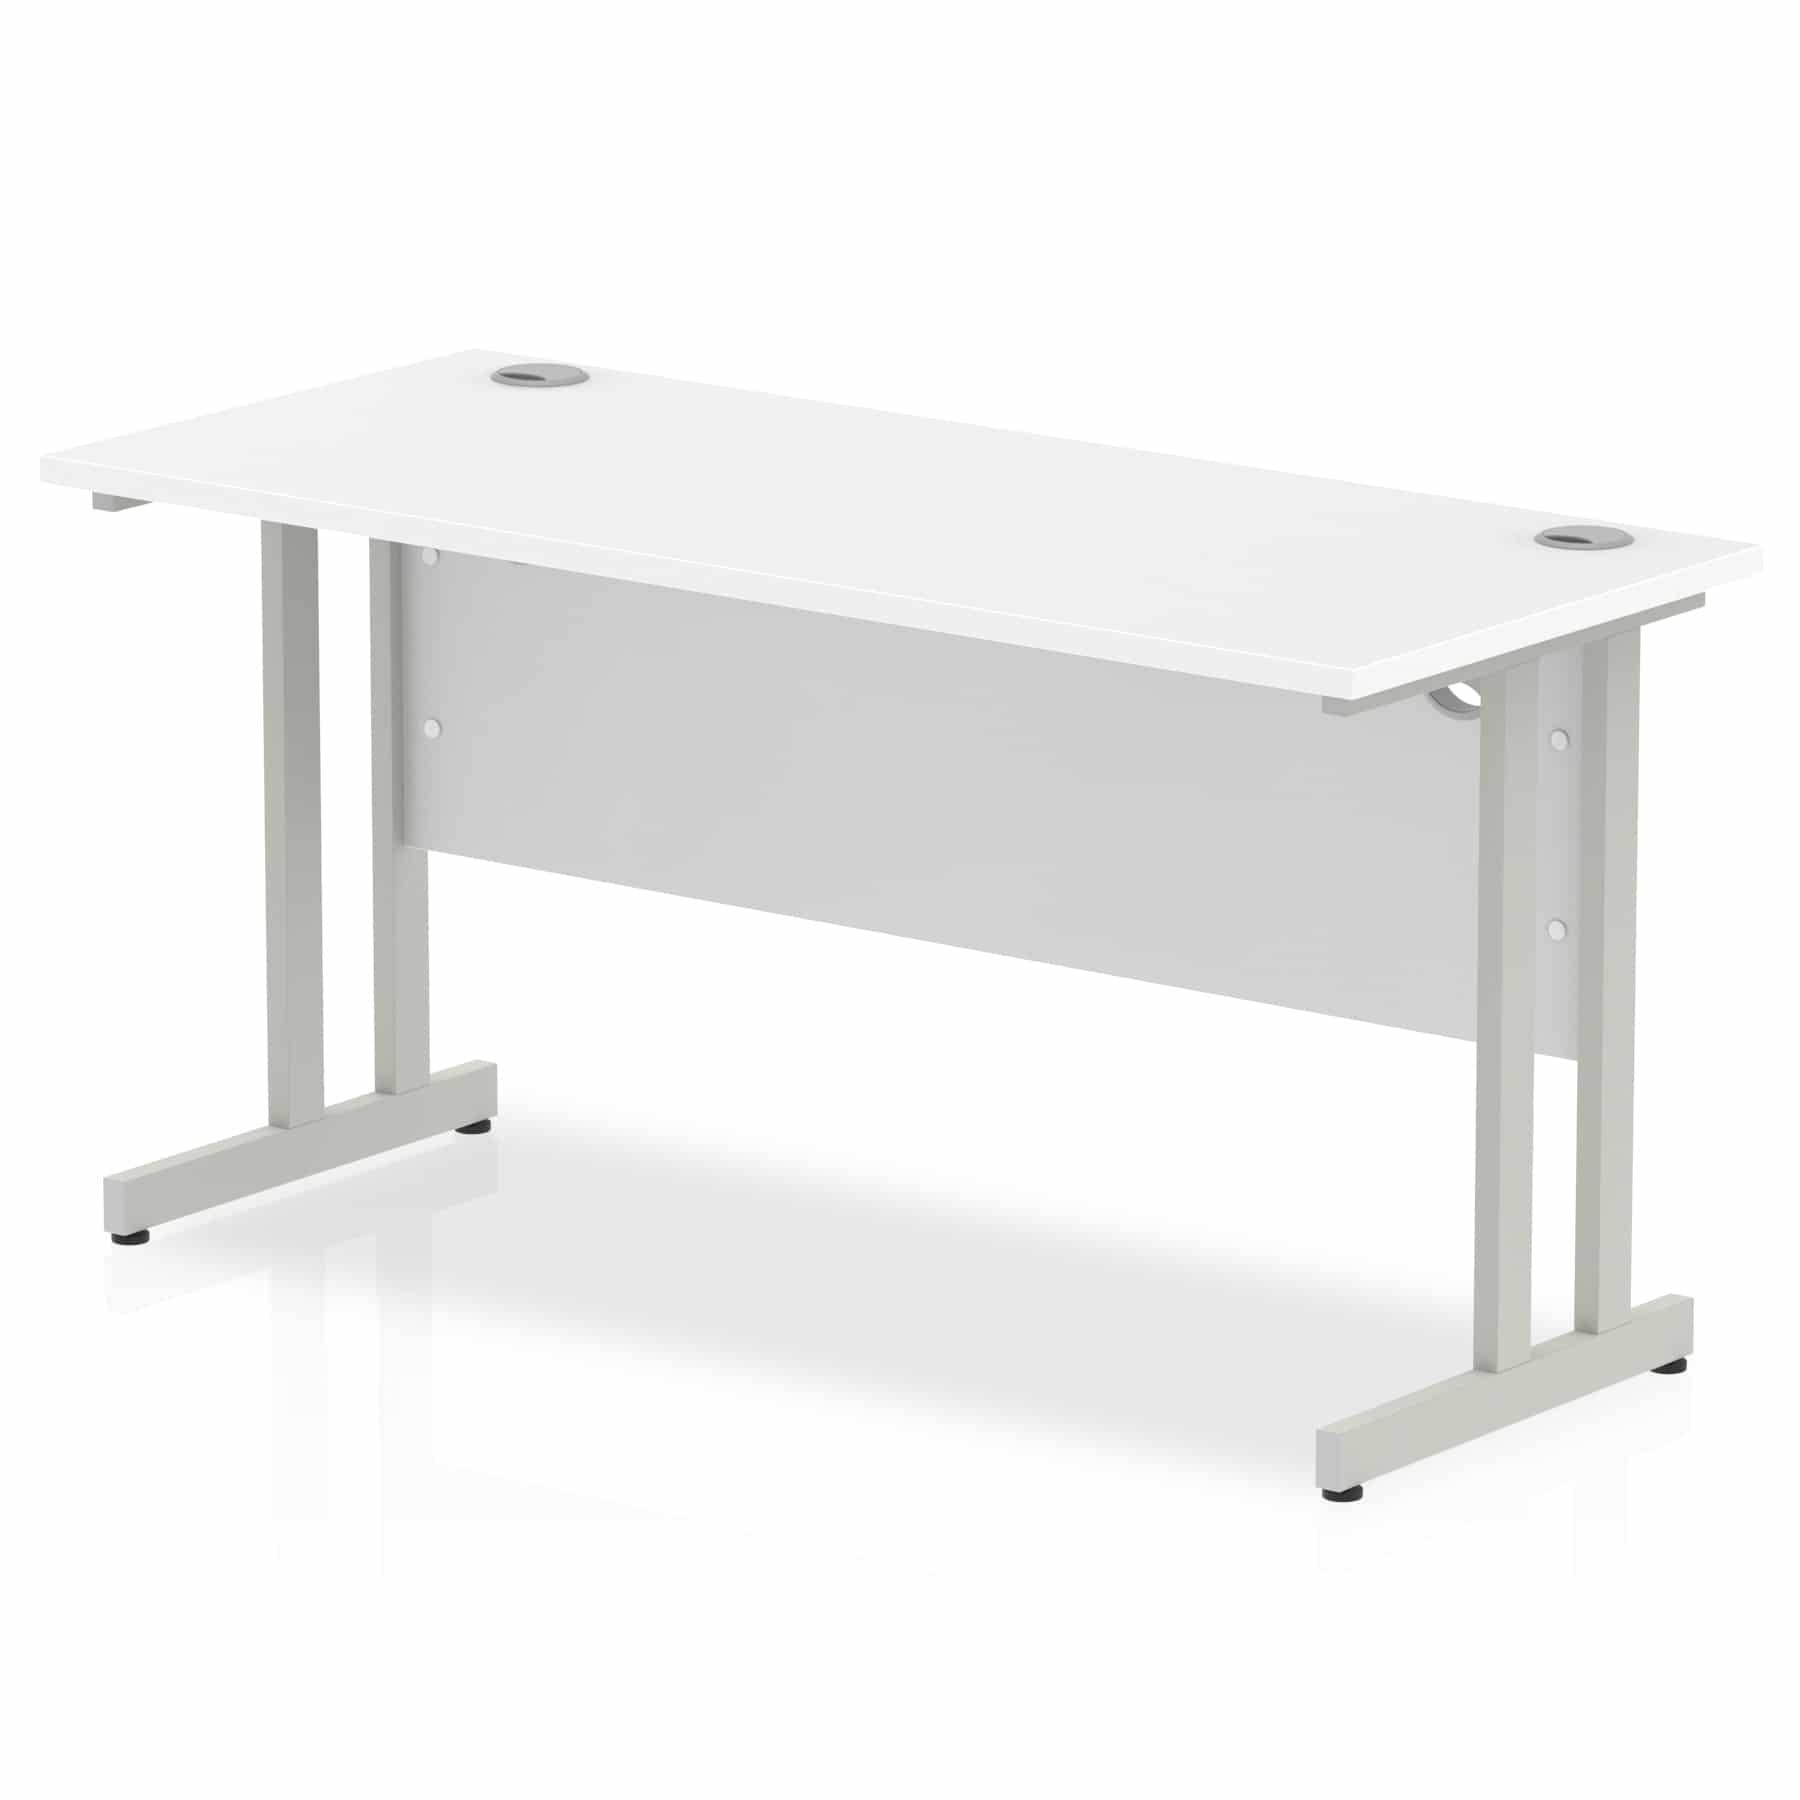 low priced 3bdcd 7cdb1 Slimline 1400mm x 600mm Rectangular Straight Desk in White